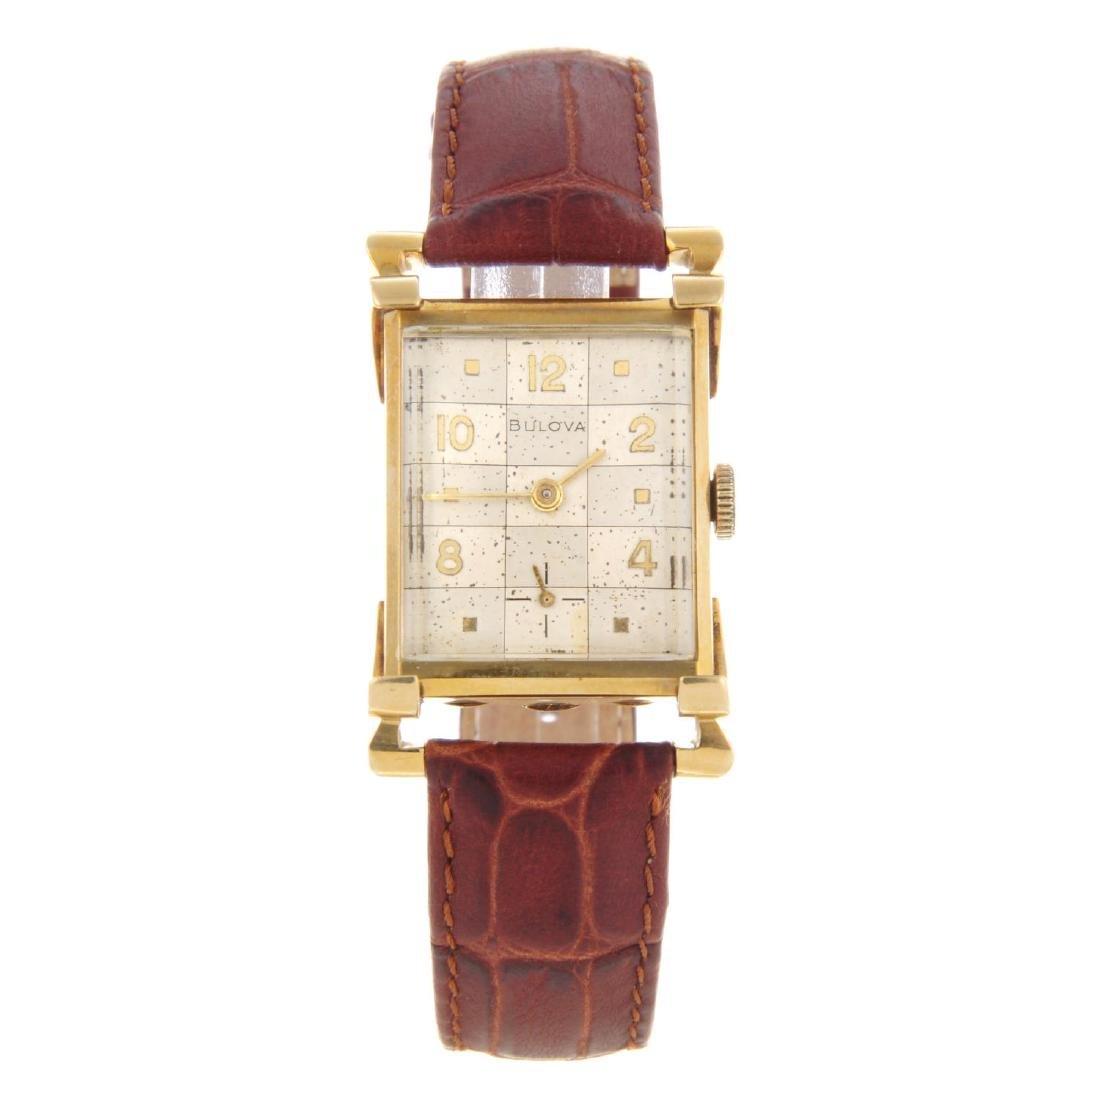 BULOVA - a mid-size wrist watch. Yellow metal case,